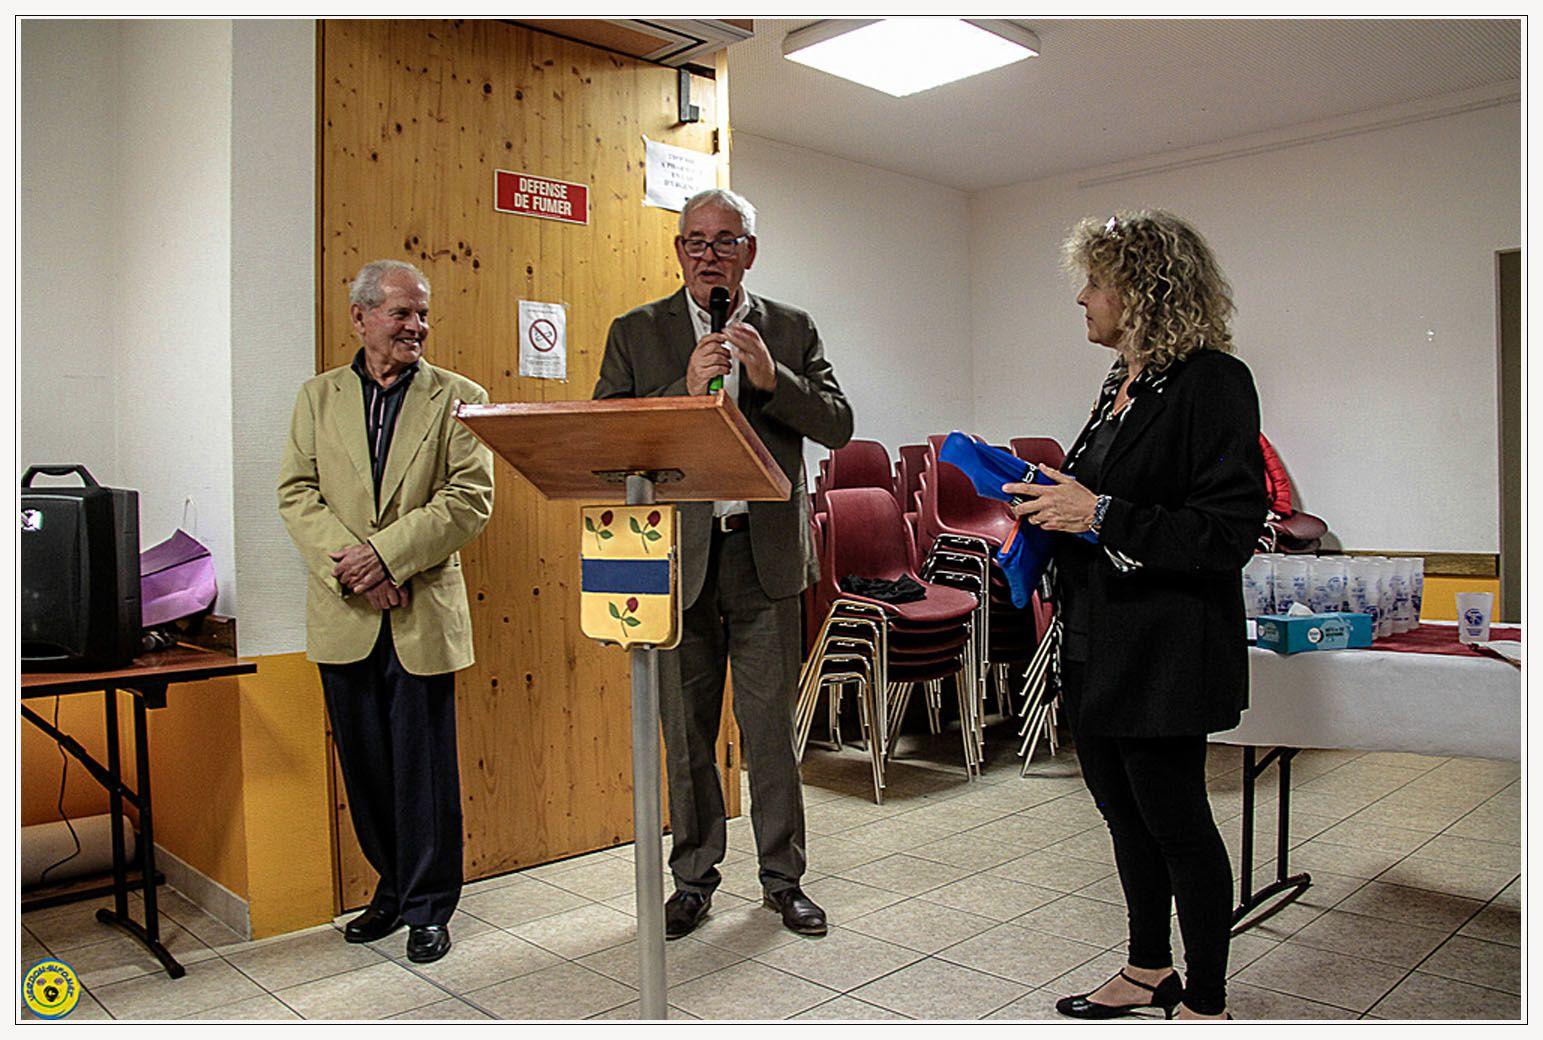 Mme Barbé , secrétaire de mairie prend sa retraite , octobre 2015